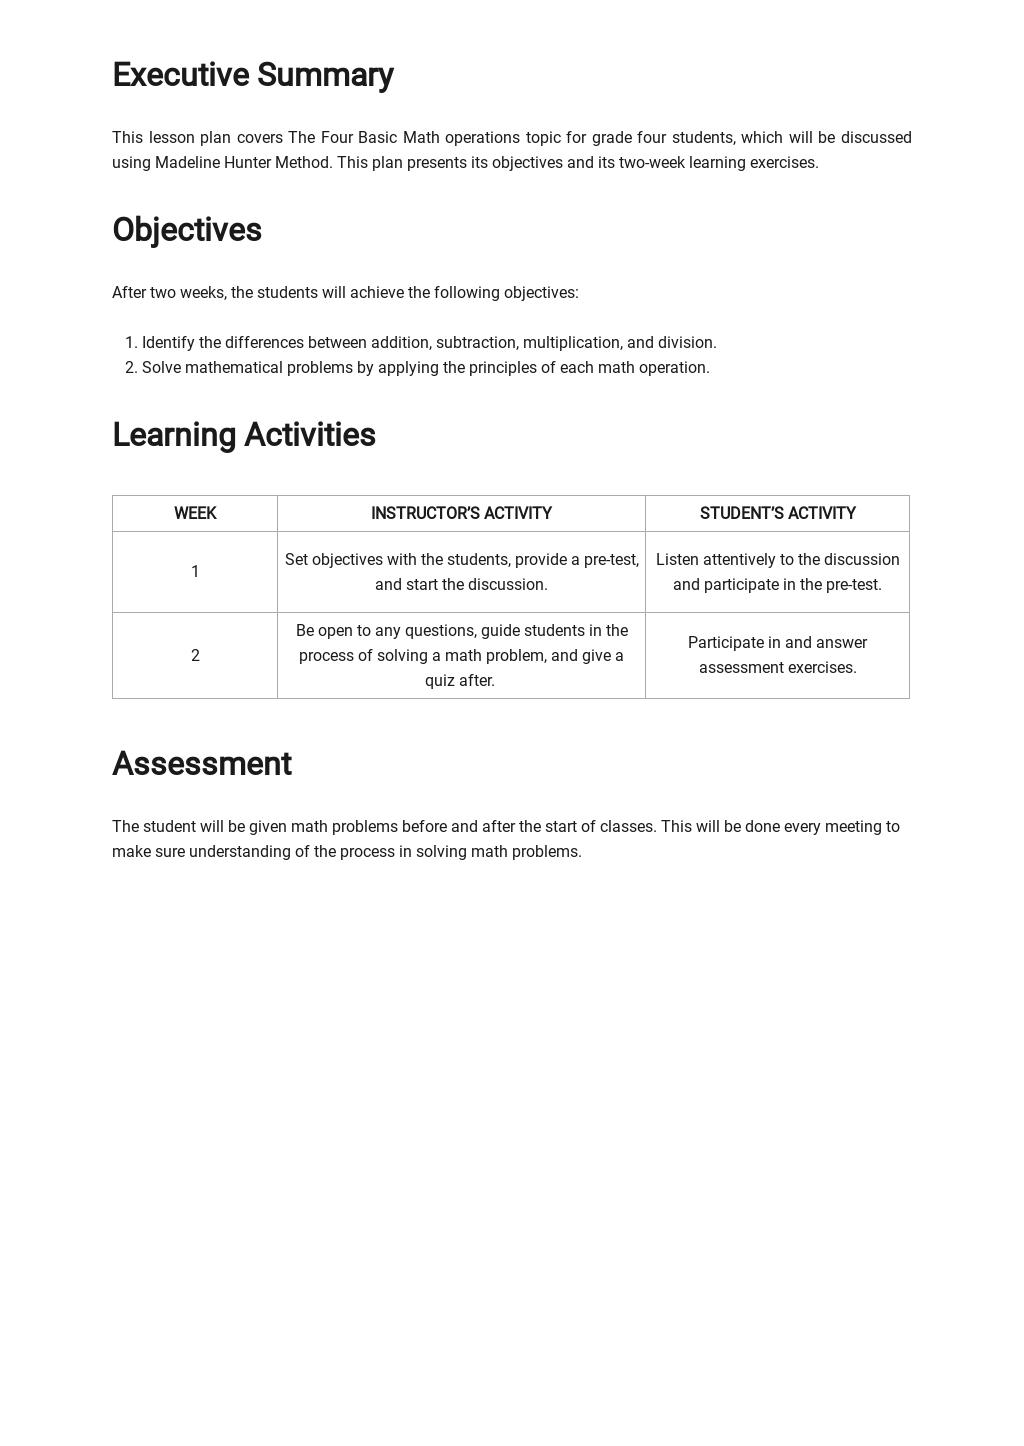 Madeline Hunter Math Lesson Plan Template 1.jpe